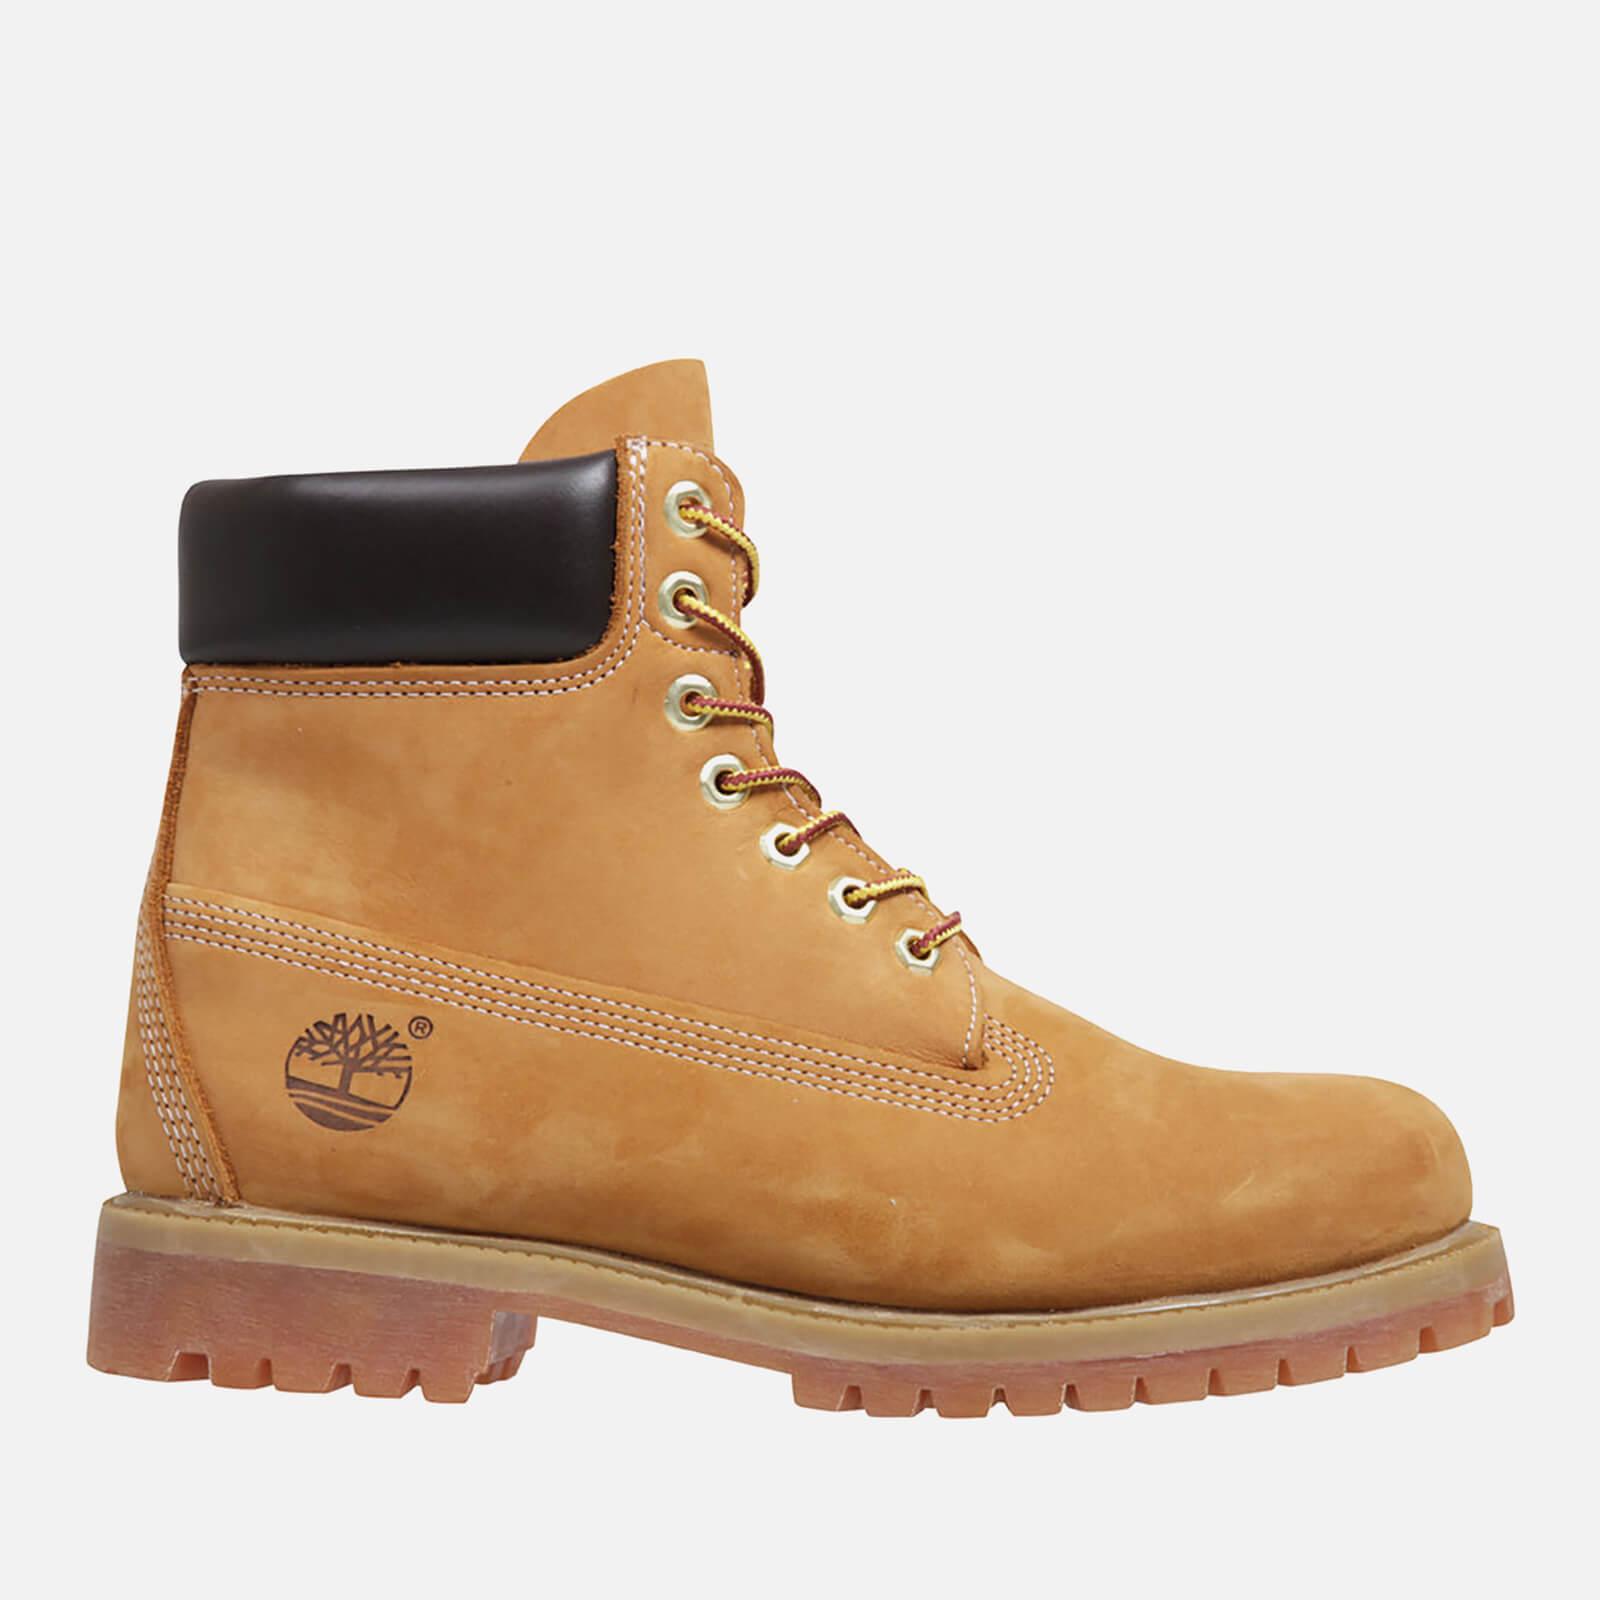 6 Inch Premium Waterproof Boots - Wheat